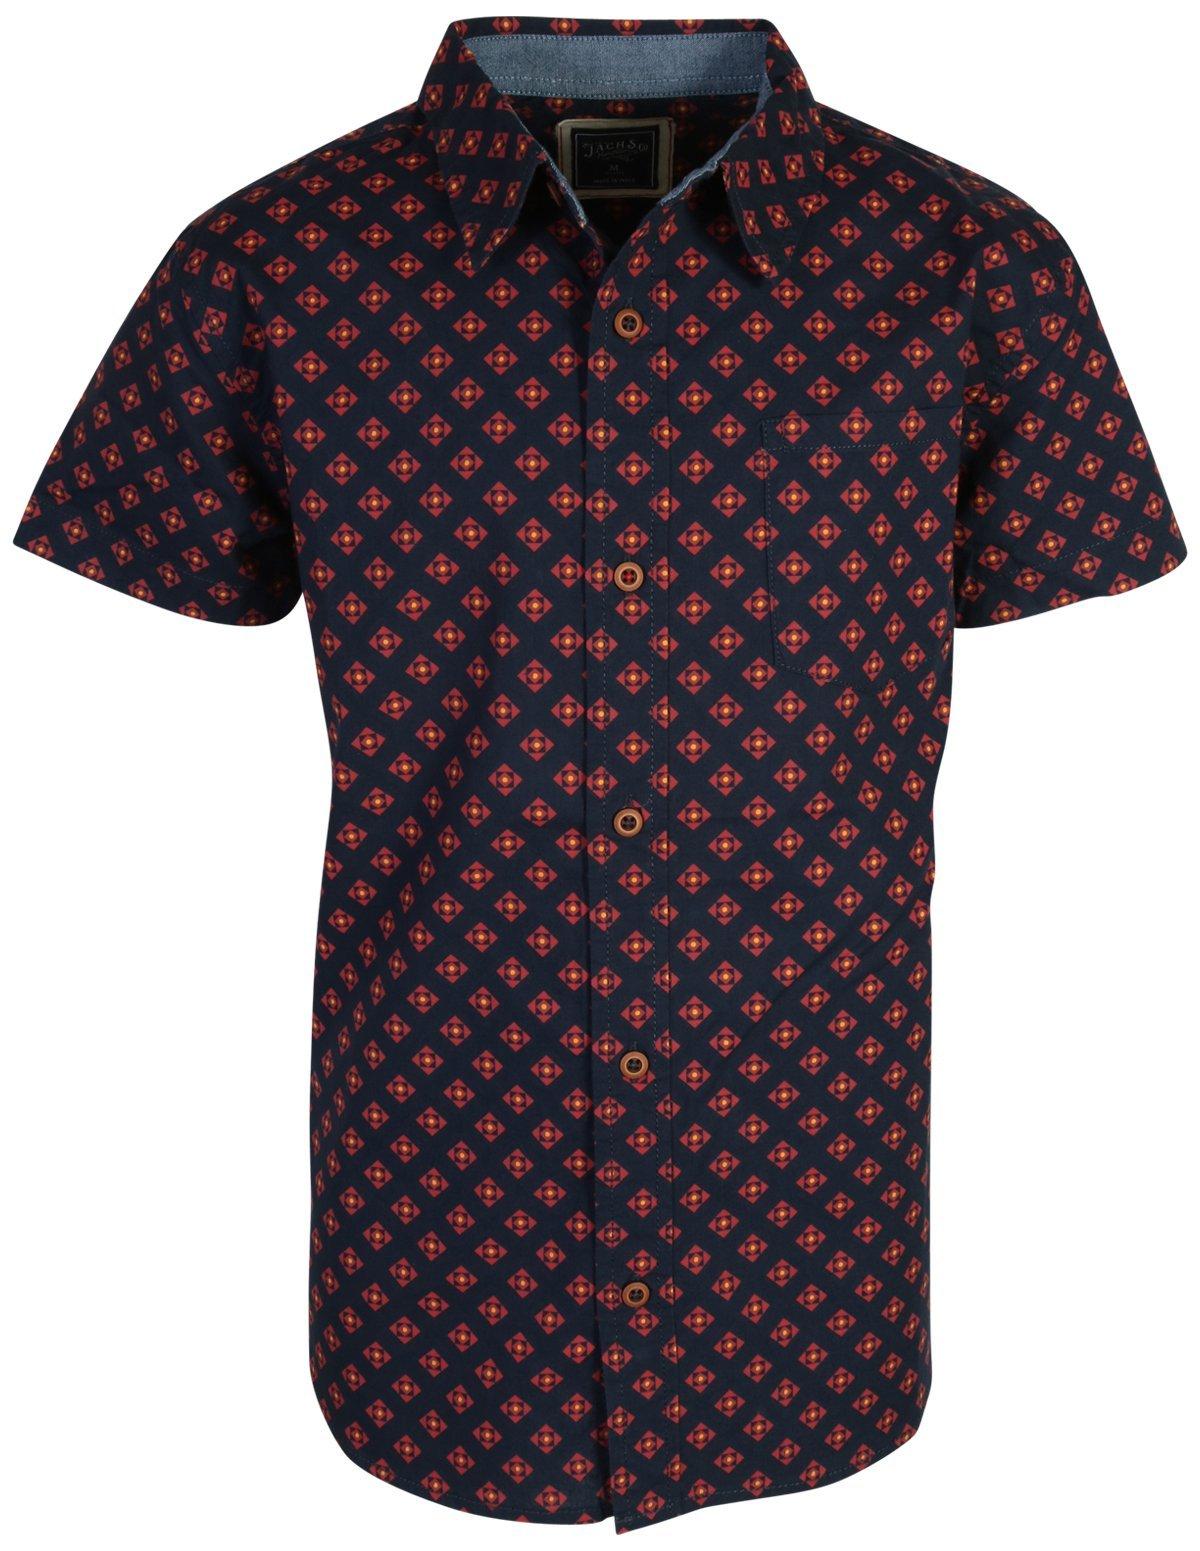 Jachs Boys Short Sleeve Button Down Shirt, Motif Navy, Size 14/16'